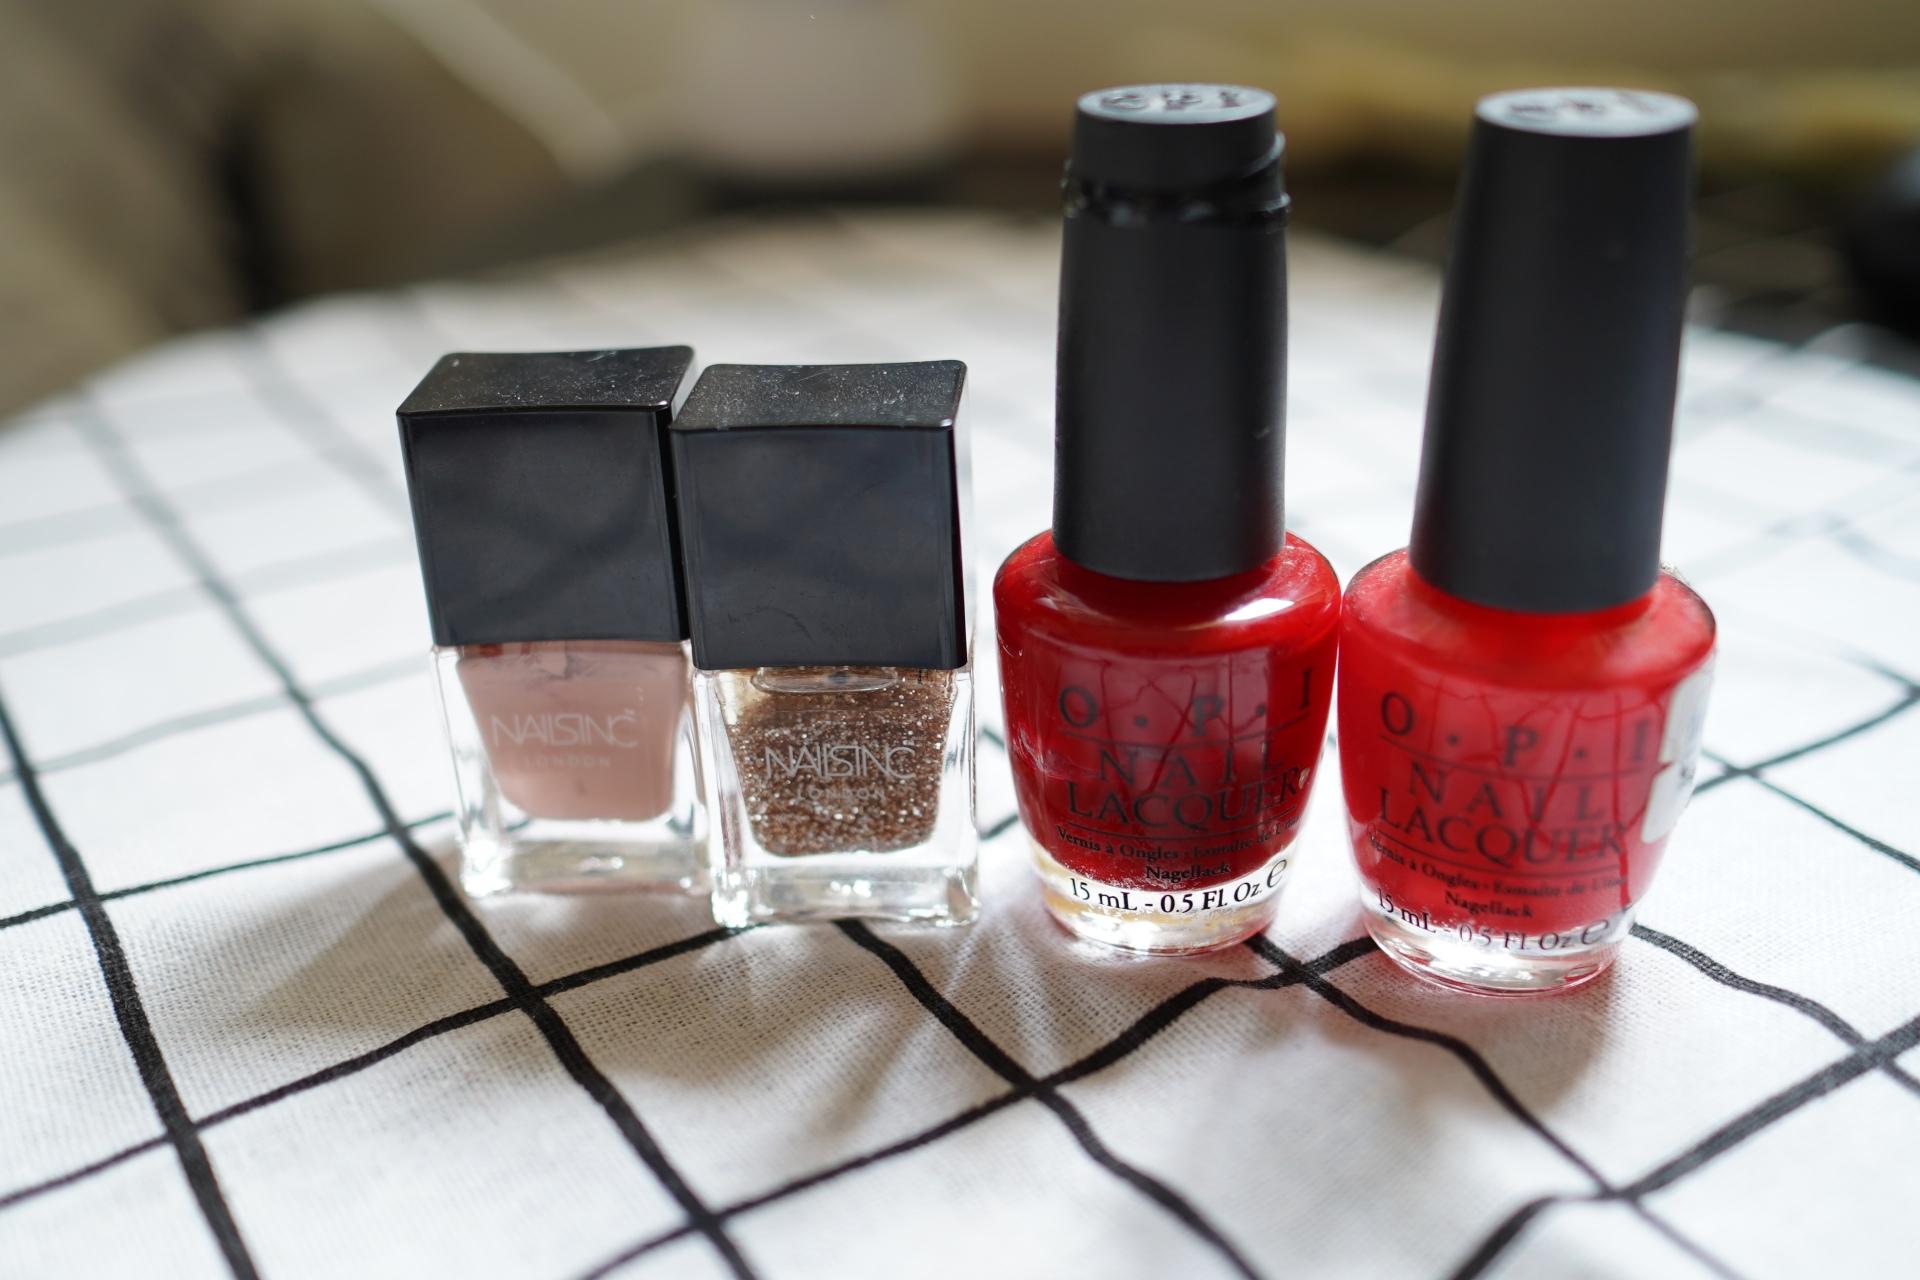 OPI vs. Nails Inc